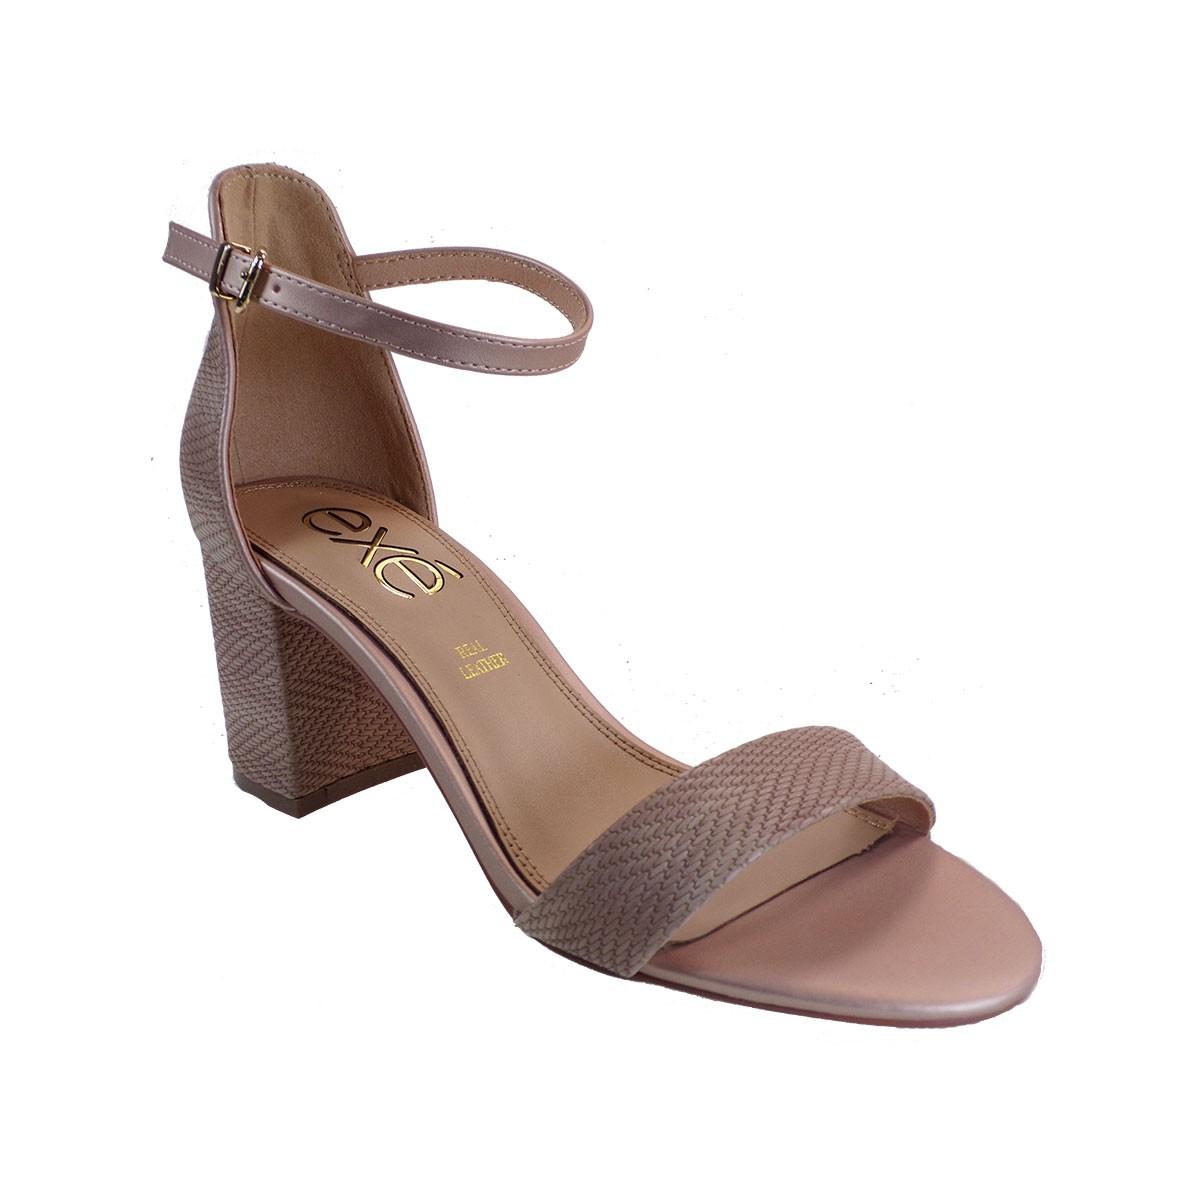 EXE Shoes Πέδιλα Γυναικεία ADELE-353 Nude M47003534775